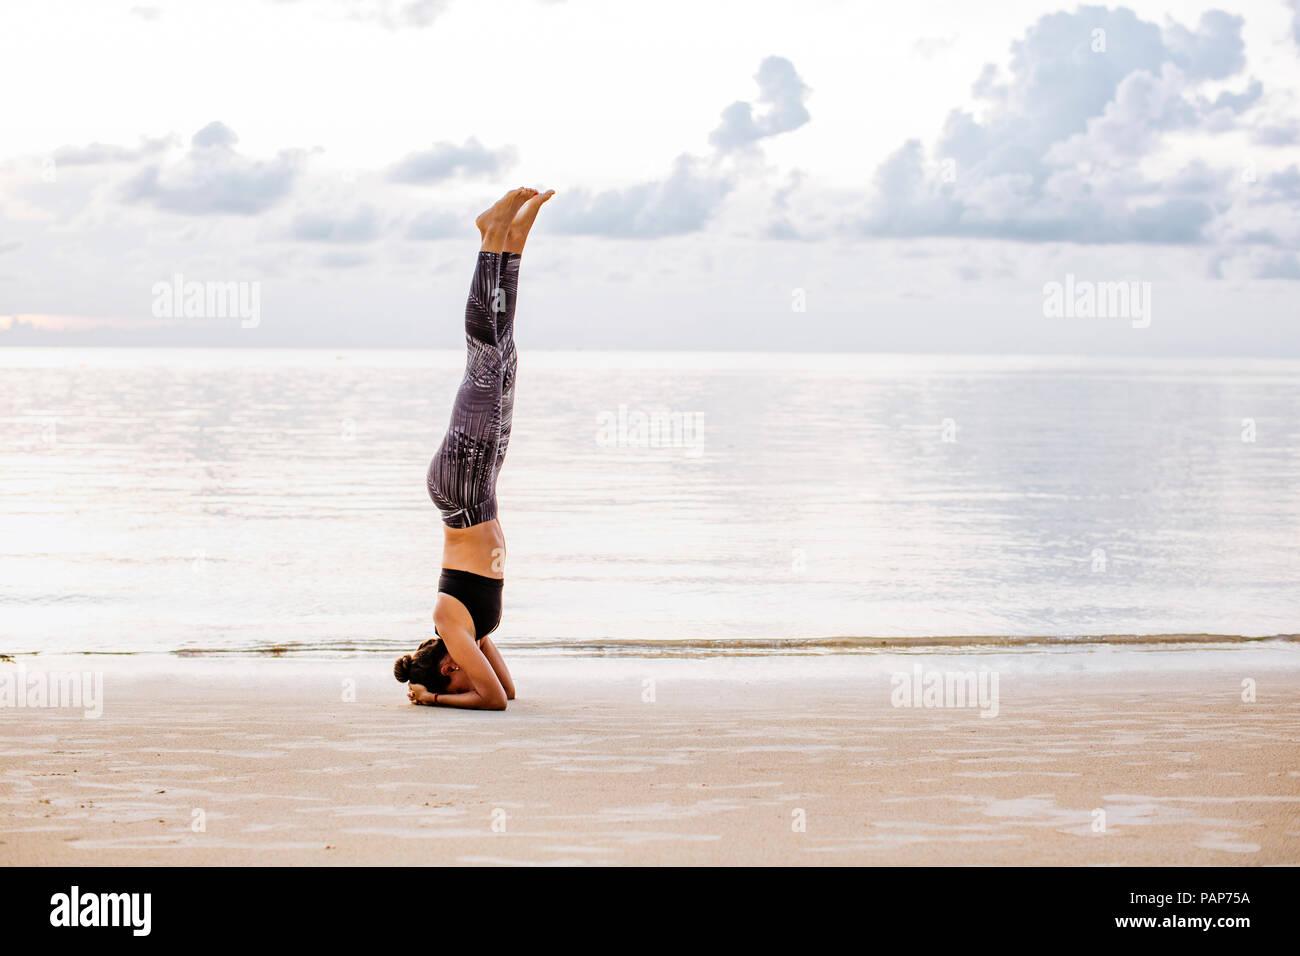 Thailand, Koh Phangan, Sportive woman doing yoga on the beach - Stock Image